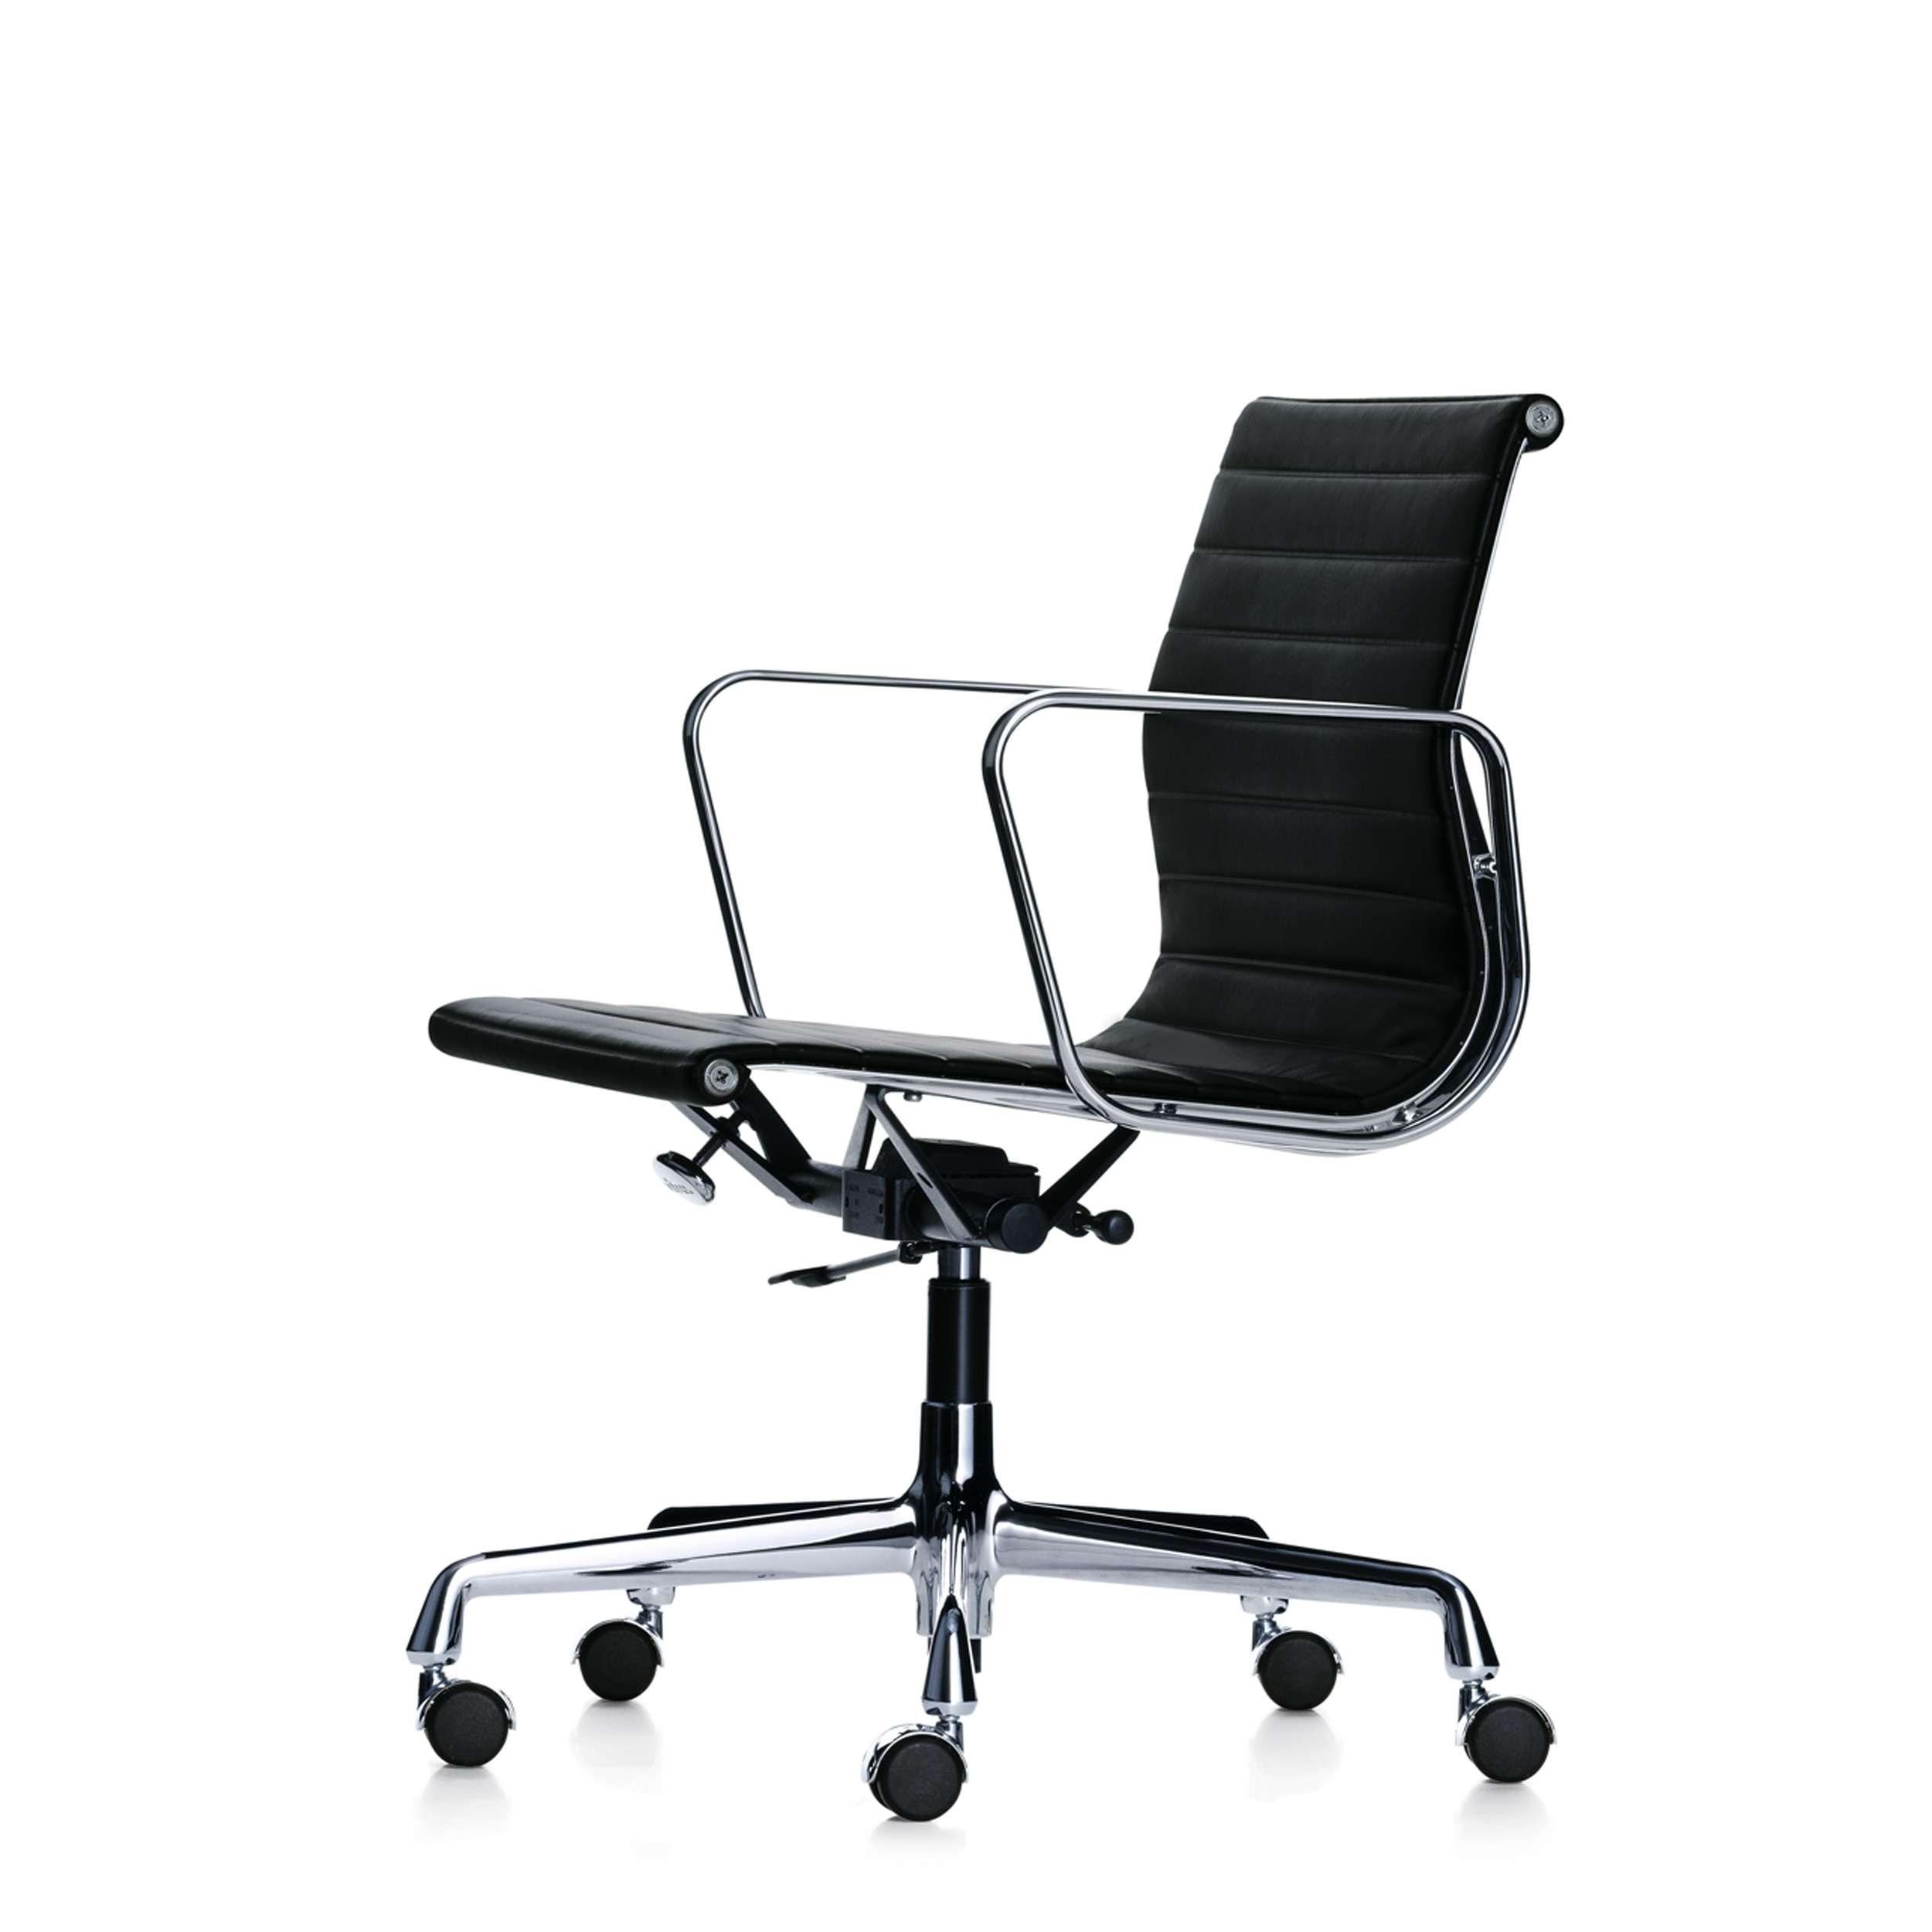 Bürostuhl designklassiker eames  Vitra Eames Aluminium Chair EA 117 Bürostuhl mittelhoher Rücken ...